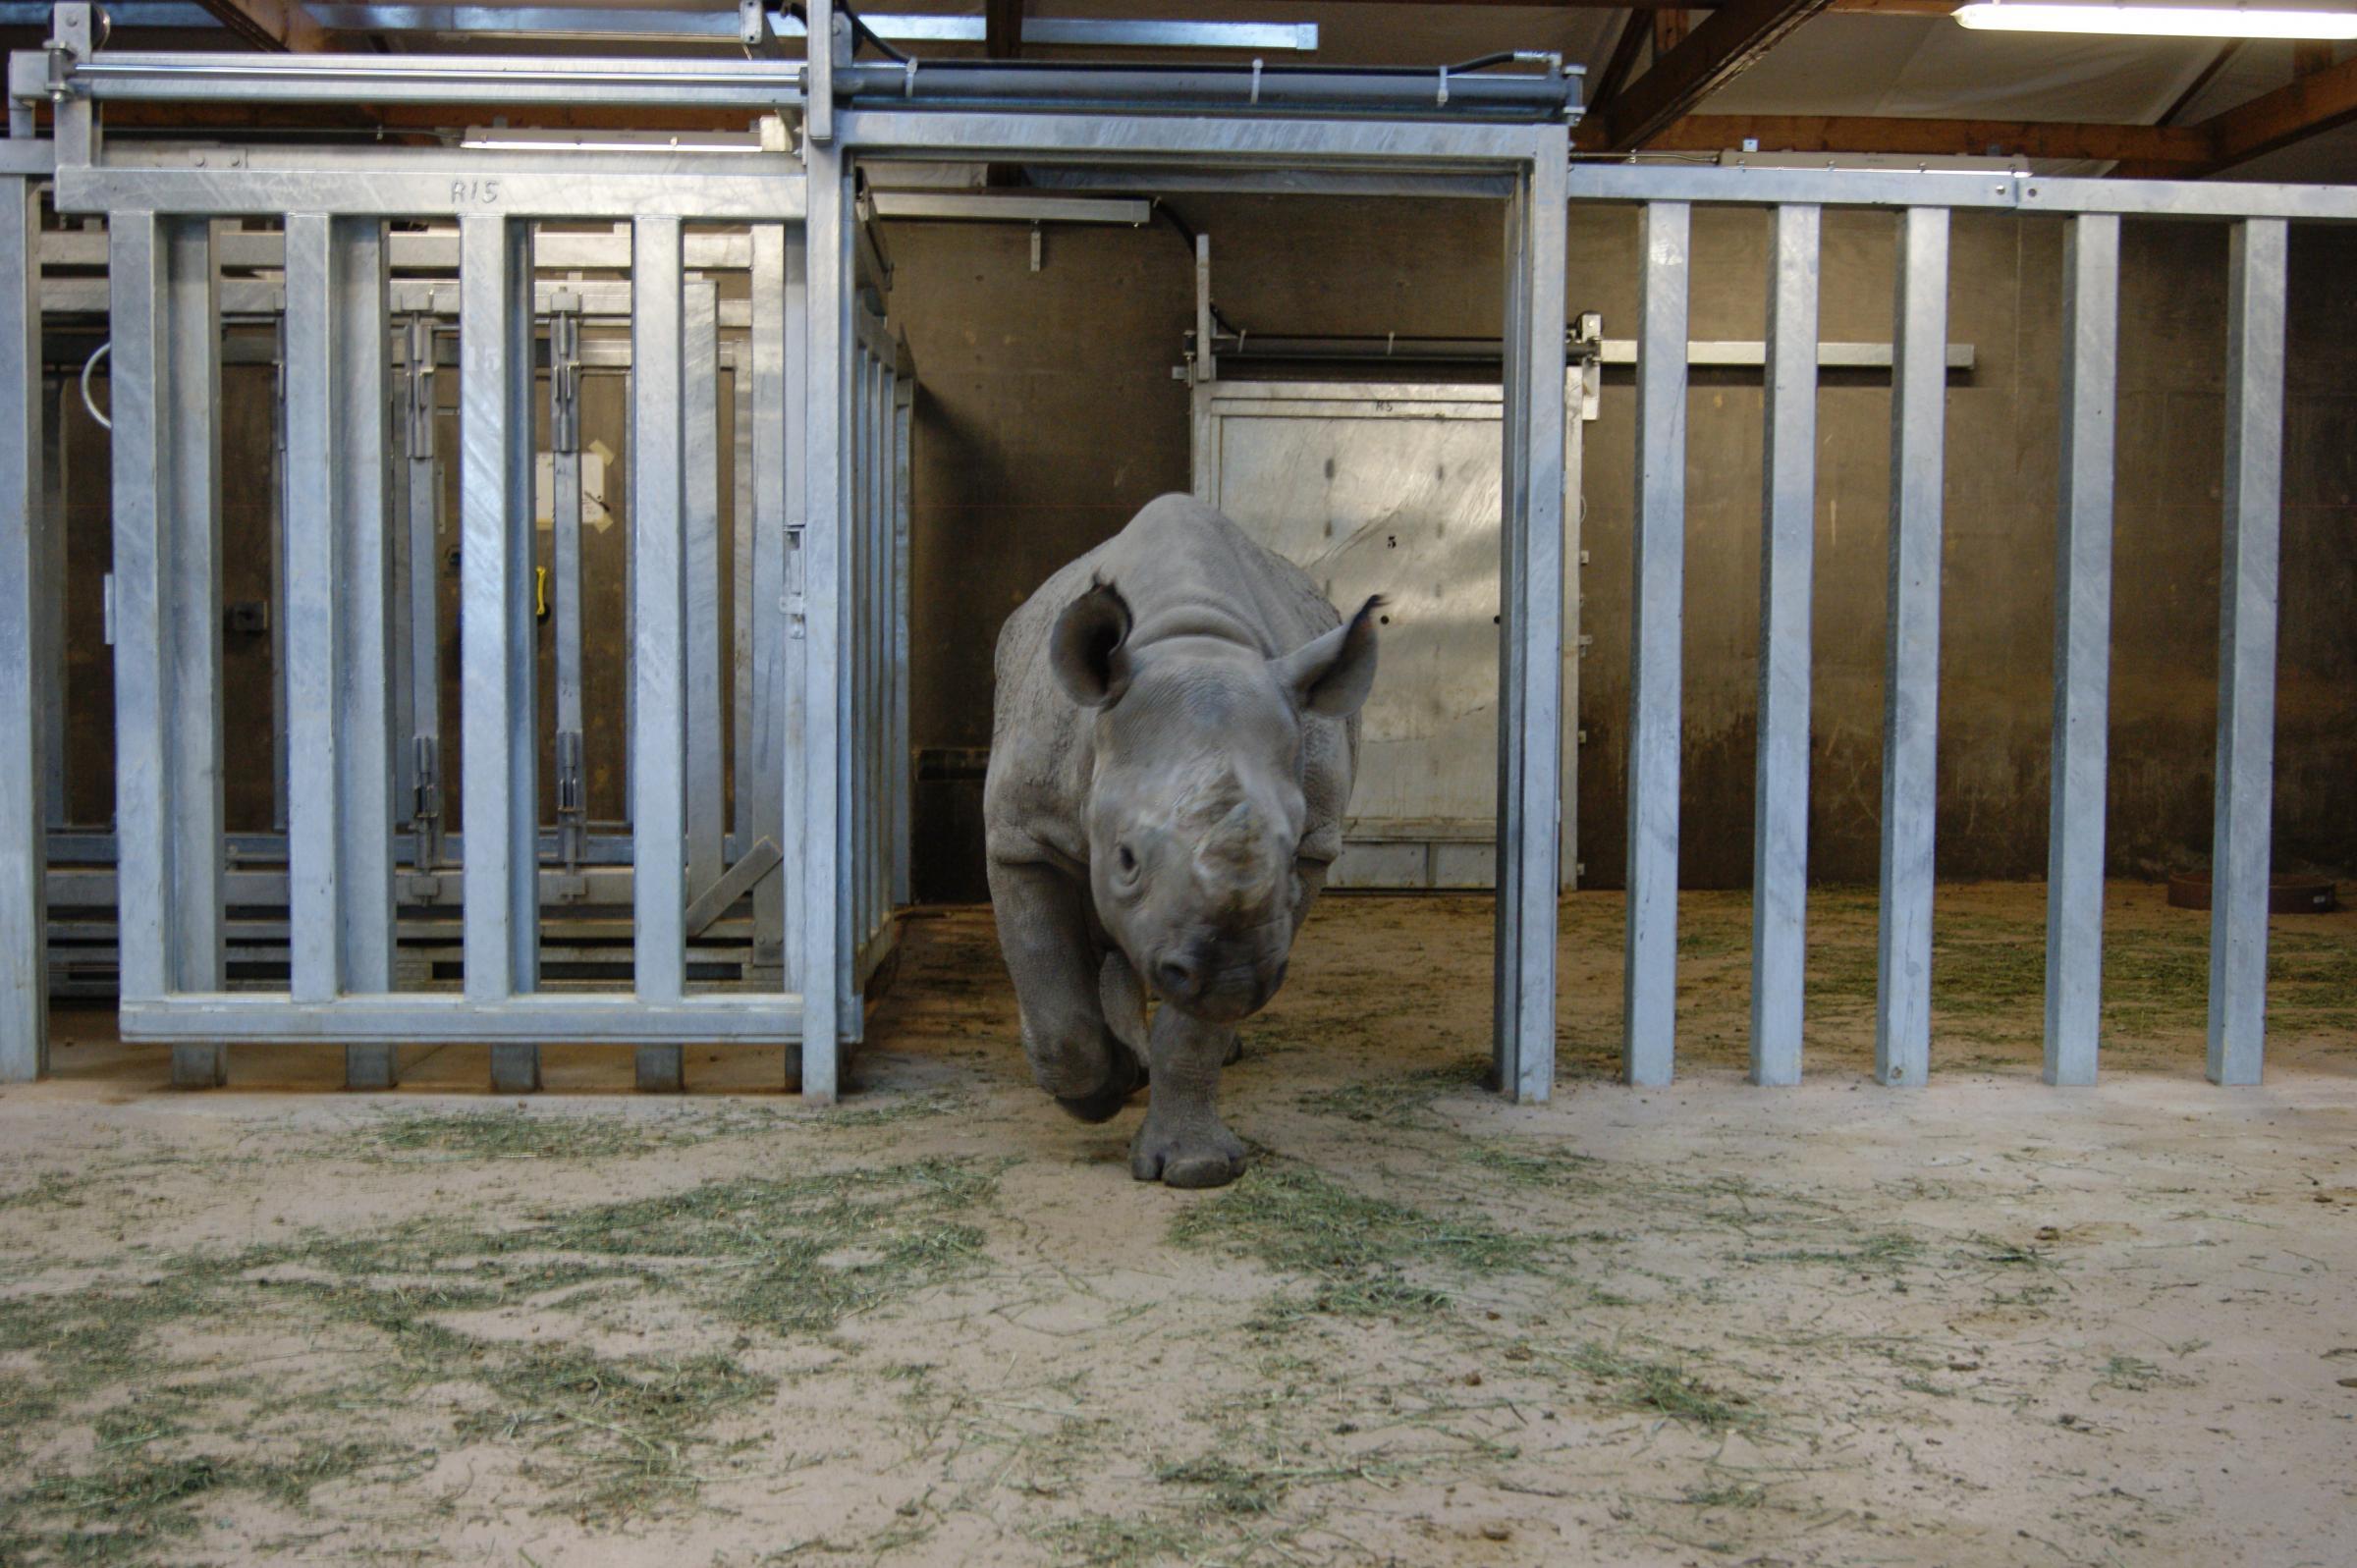 Blank Park Zoo Calendar : Des moines expecting baby rhino this fall iowa public radio